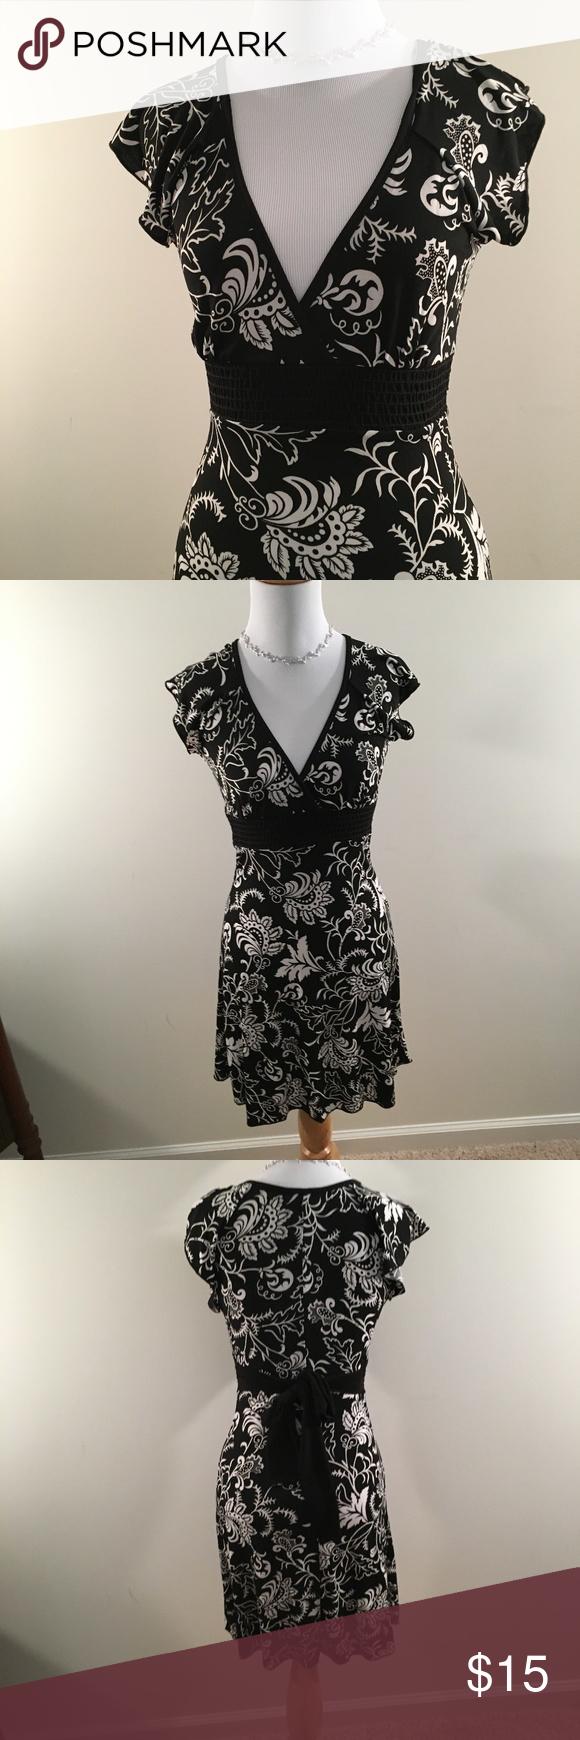 3 For 20 Sale Vtg 90s Body Central Stretchy Dress Stretchy Dress Body Central Dresses Dresses [ 1740 x 580 Pixel ]